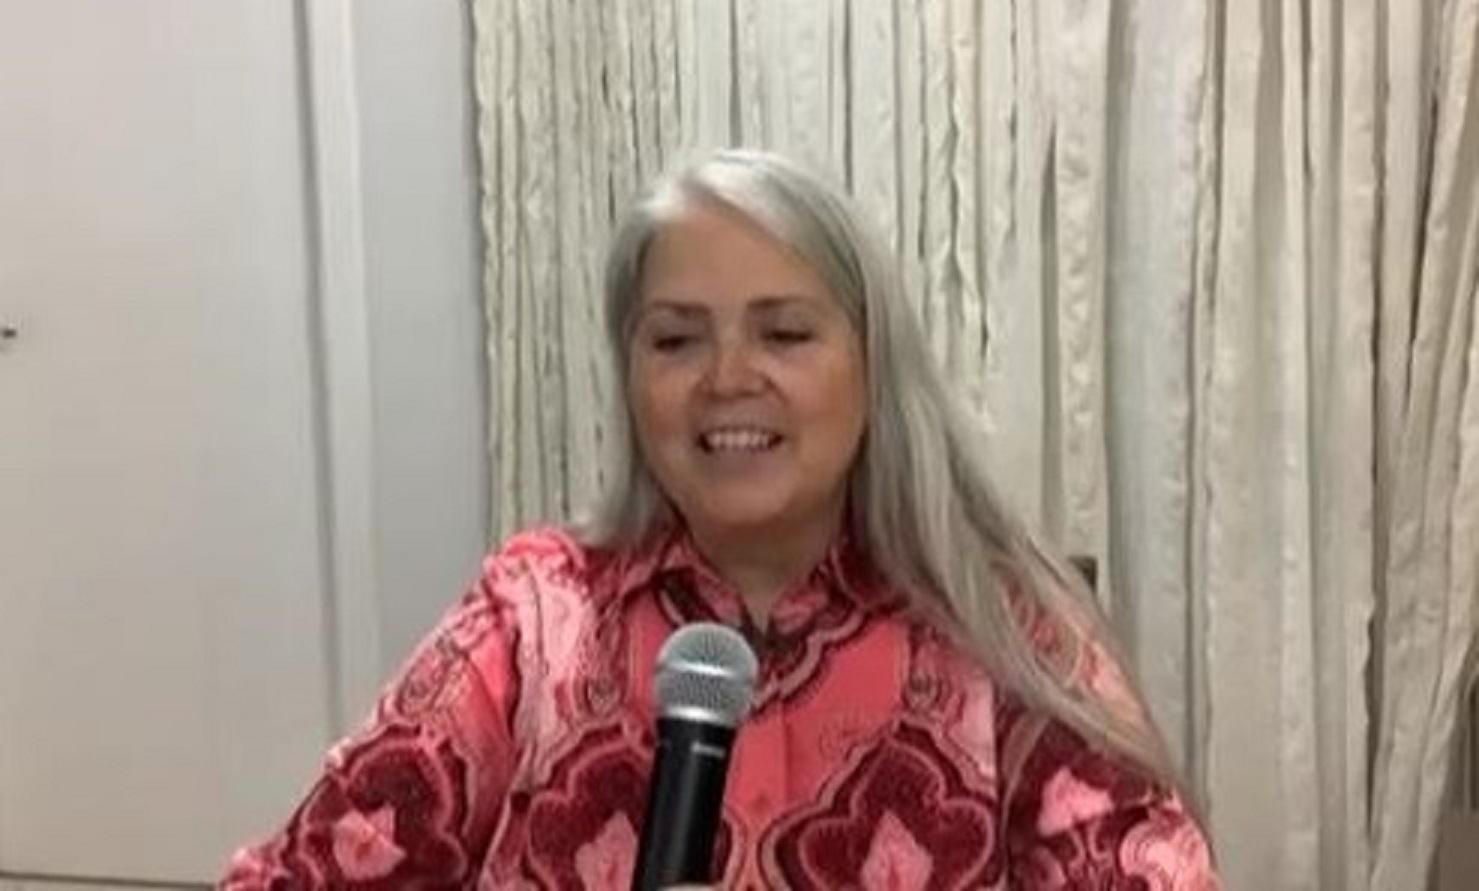 Abril de 2020 Conferência Mundial do Projeto Sião no Brasil, discurso da Irmã Whitefield